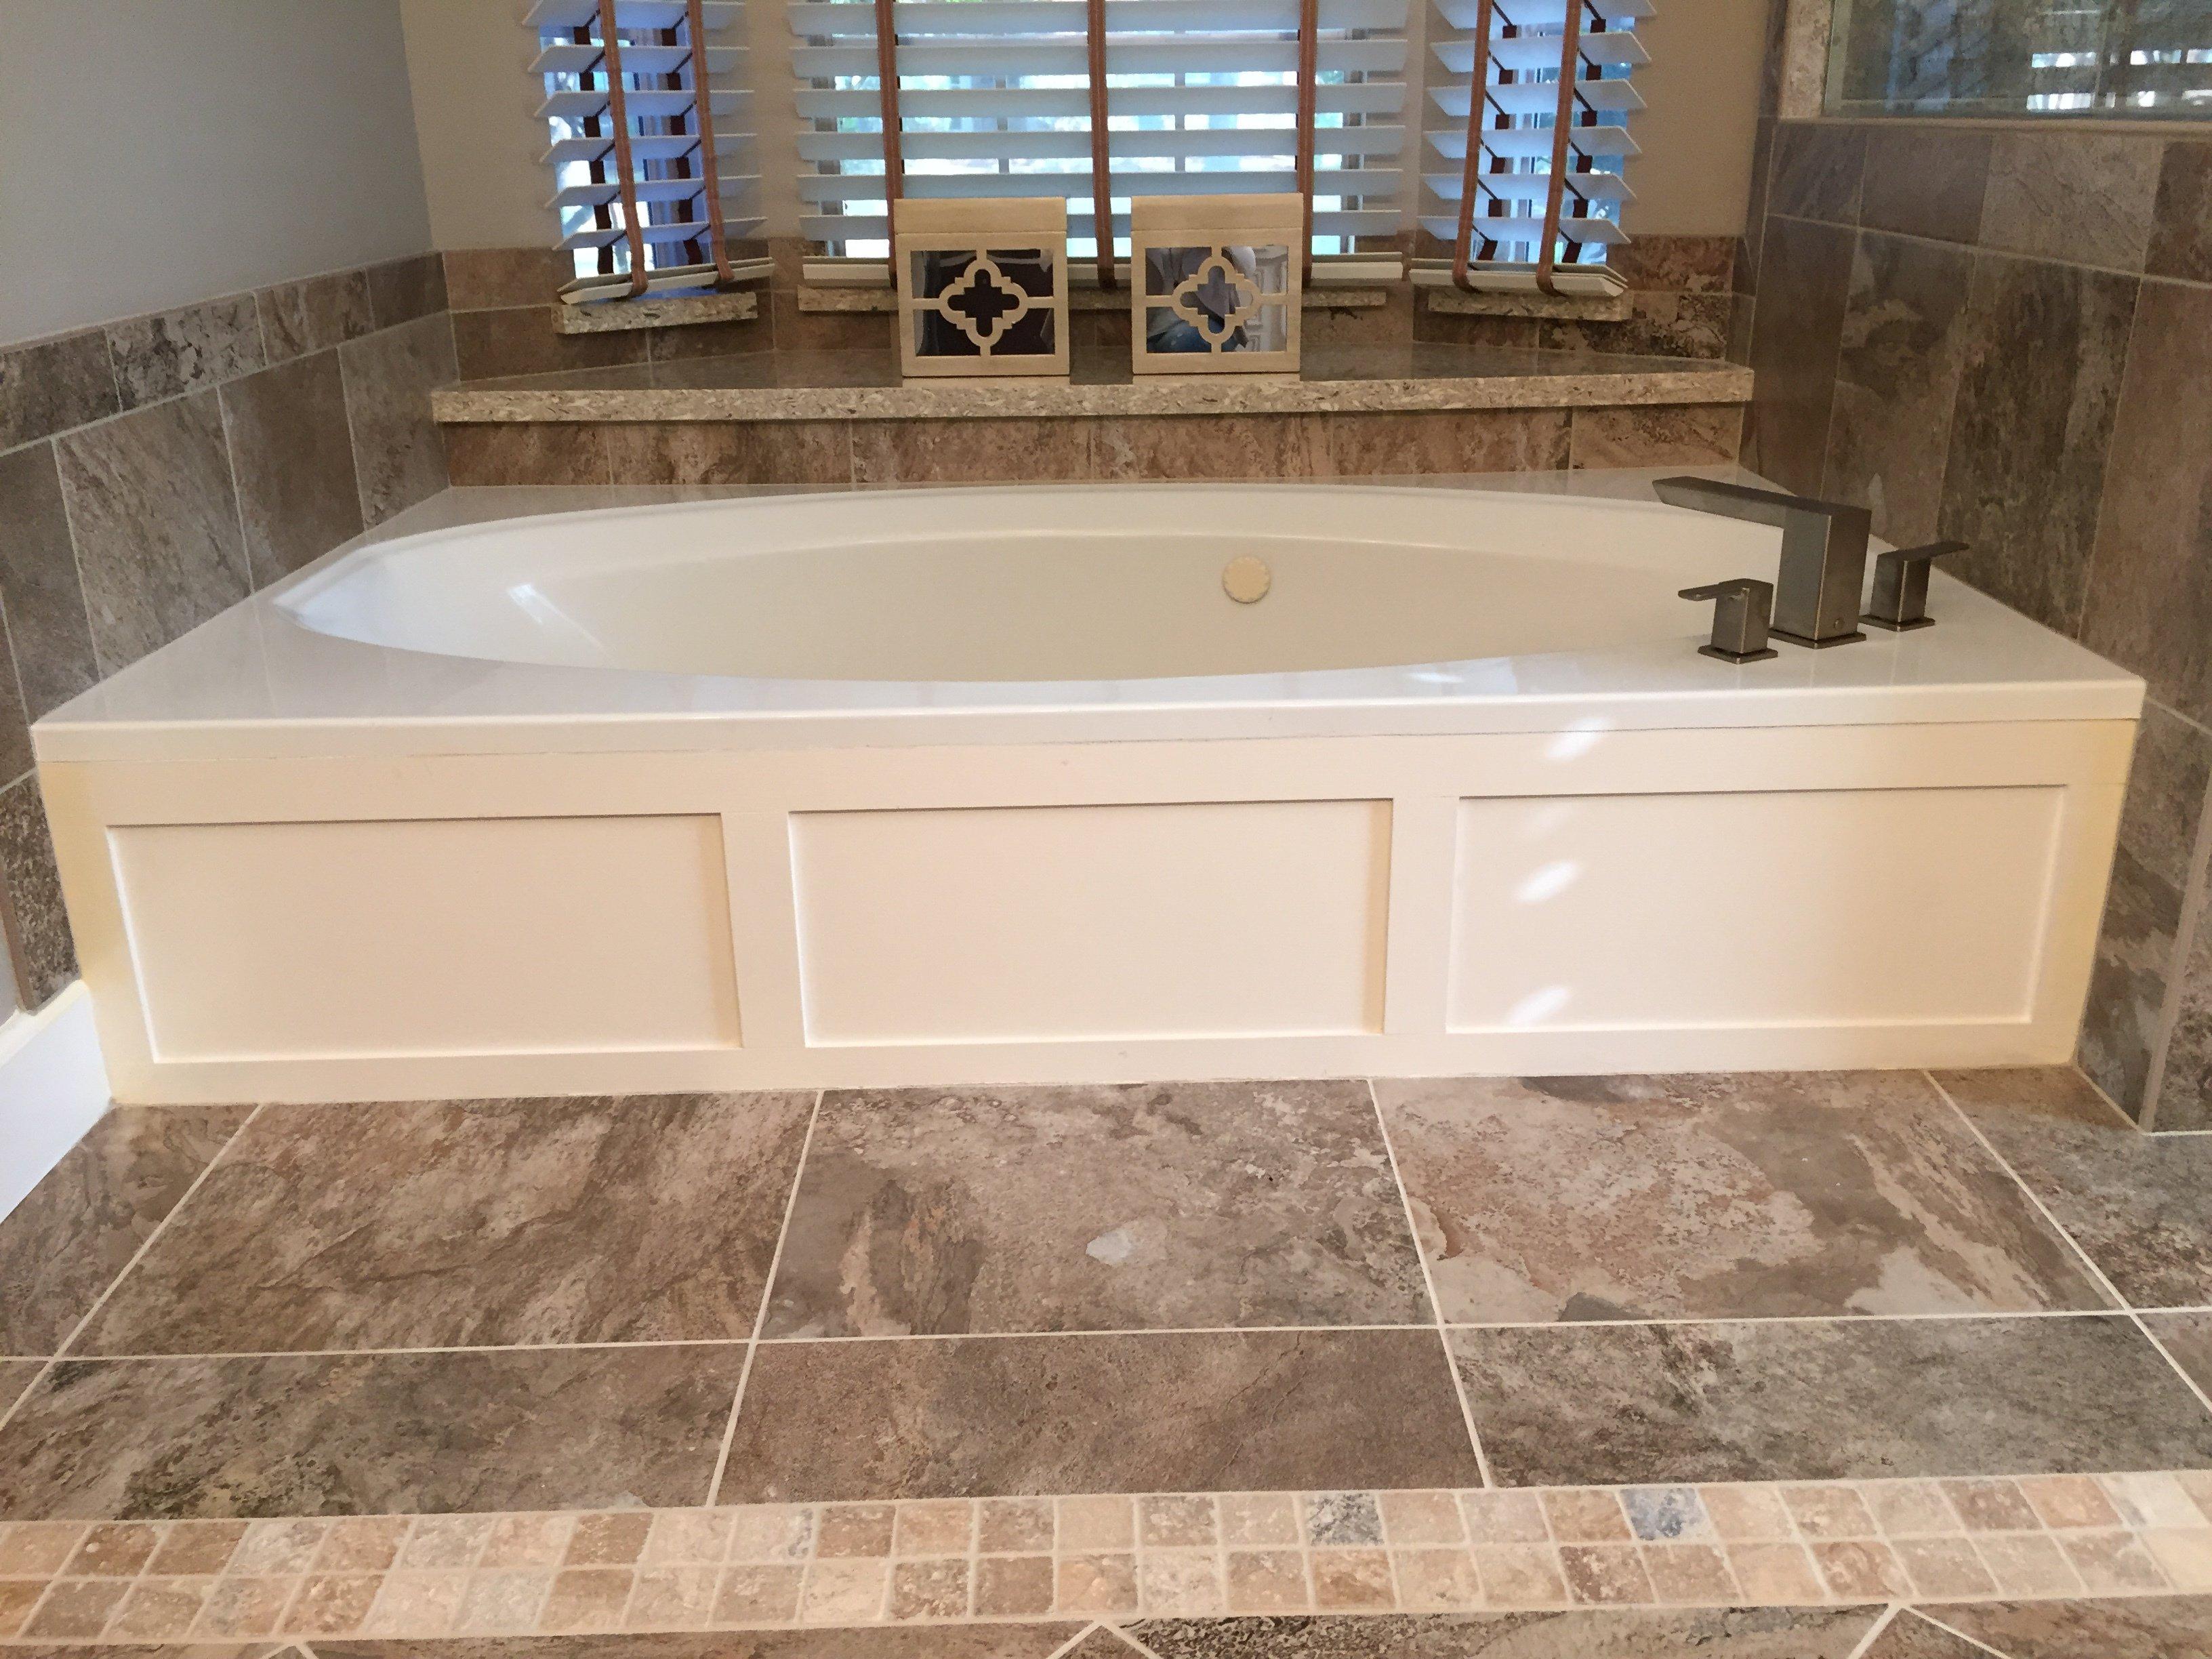 Bathroom flooring and tub